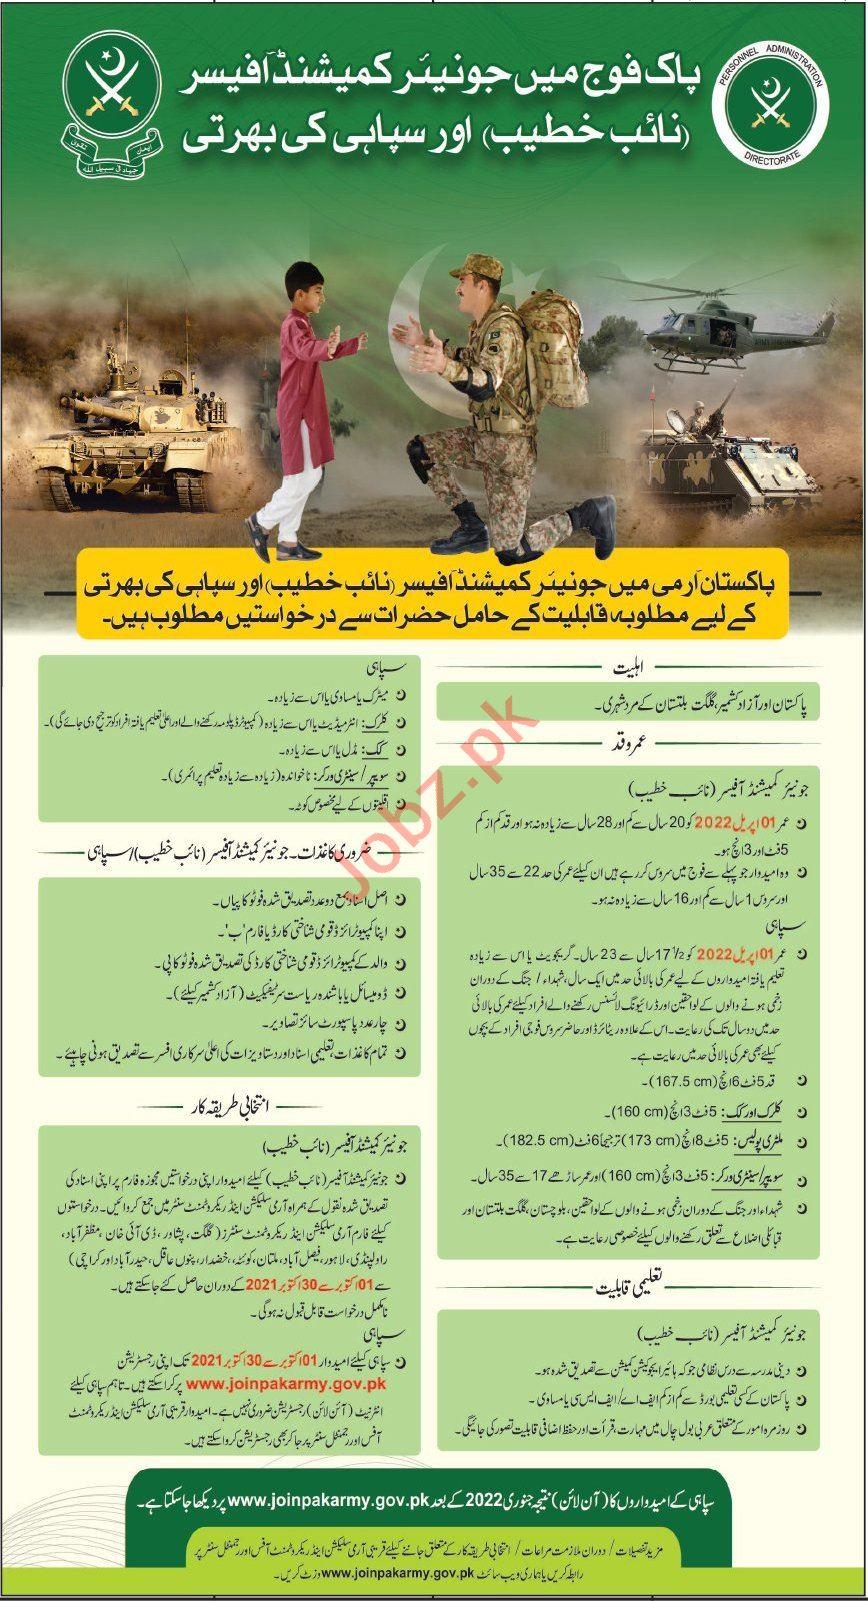 Jobs in Pakistan Army